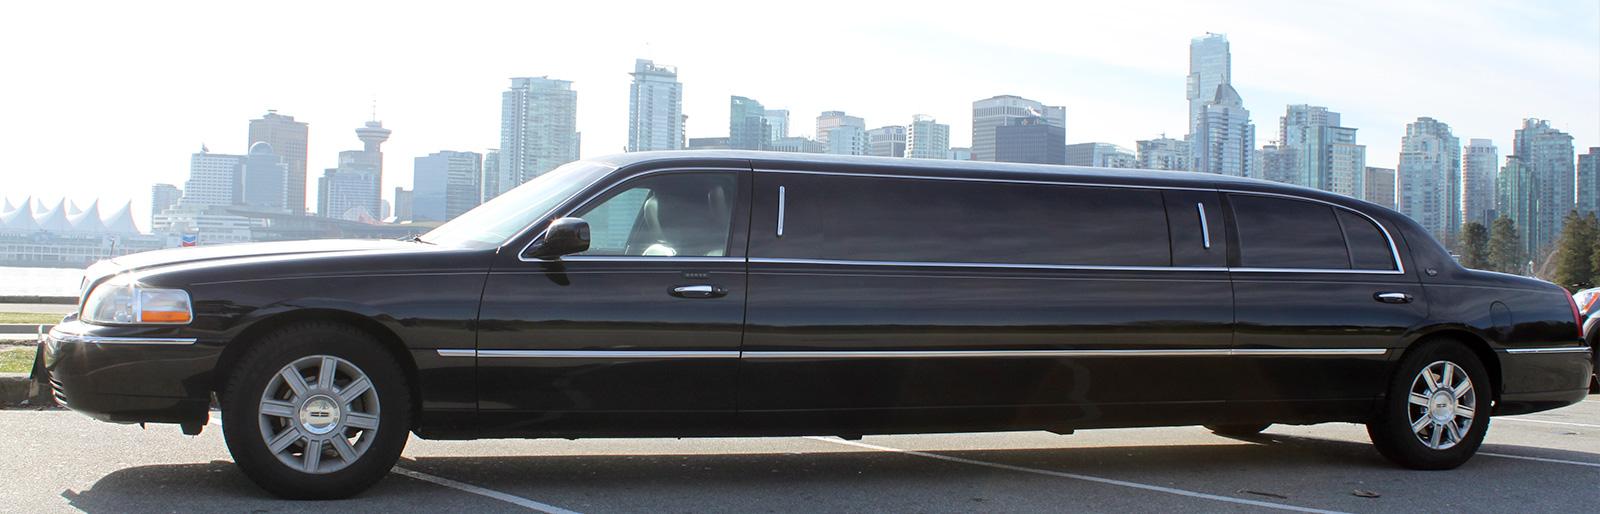 eternity-limo-slide06